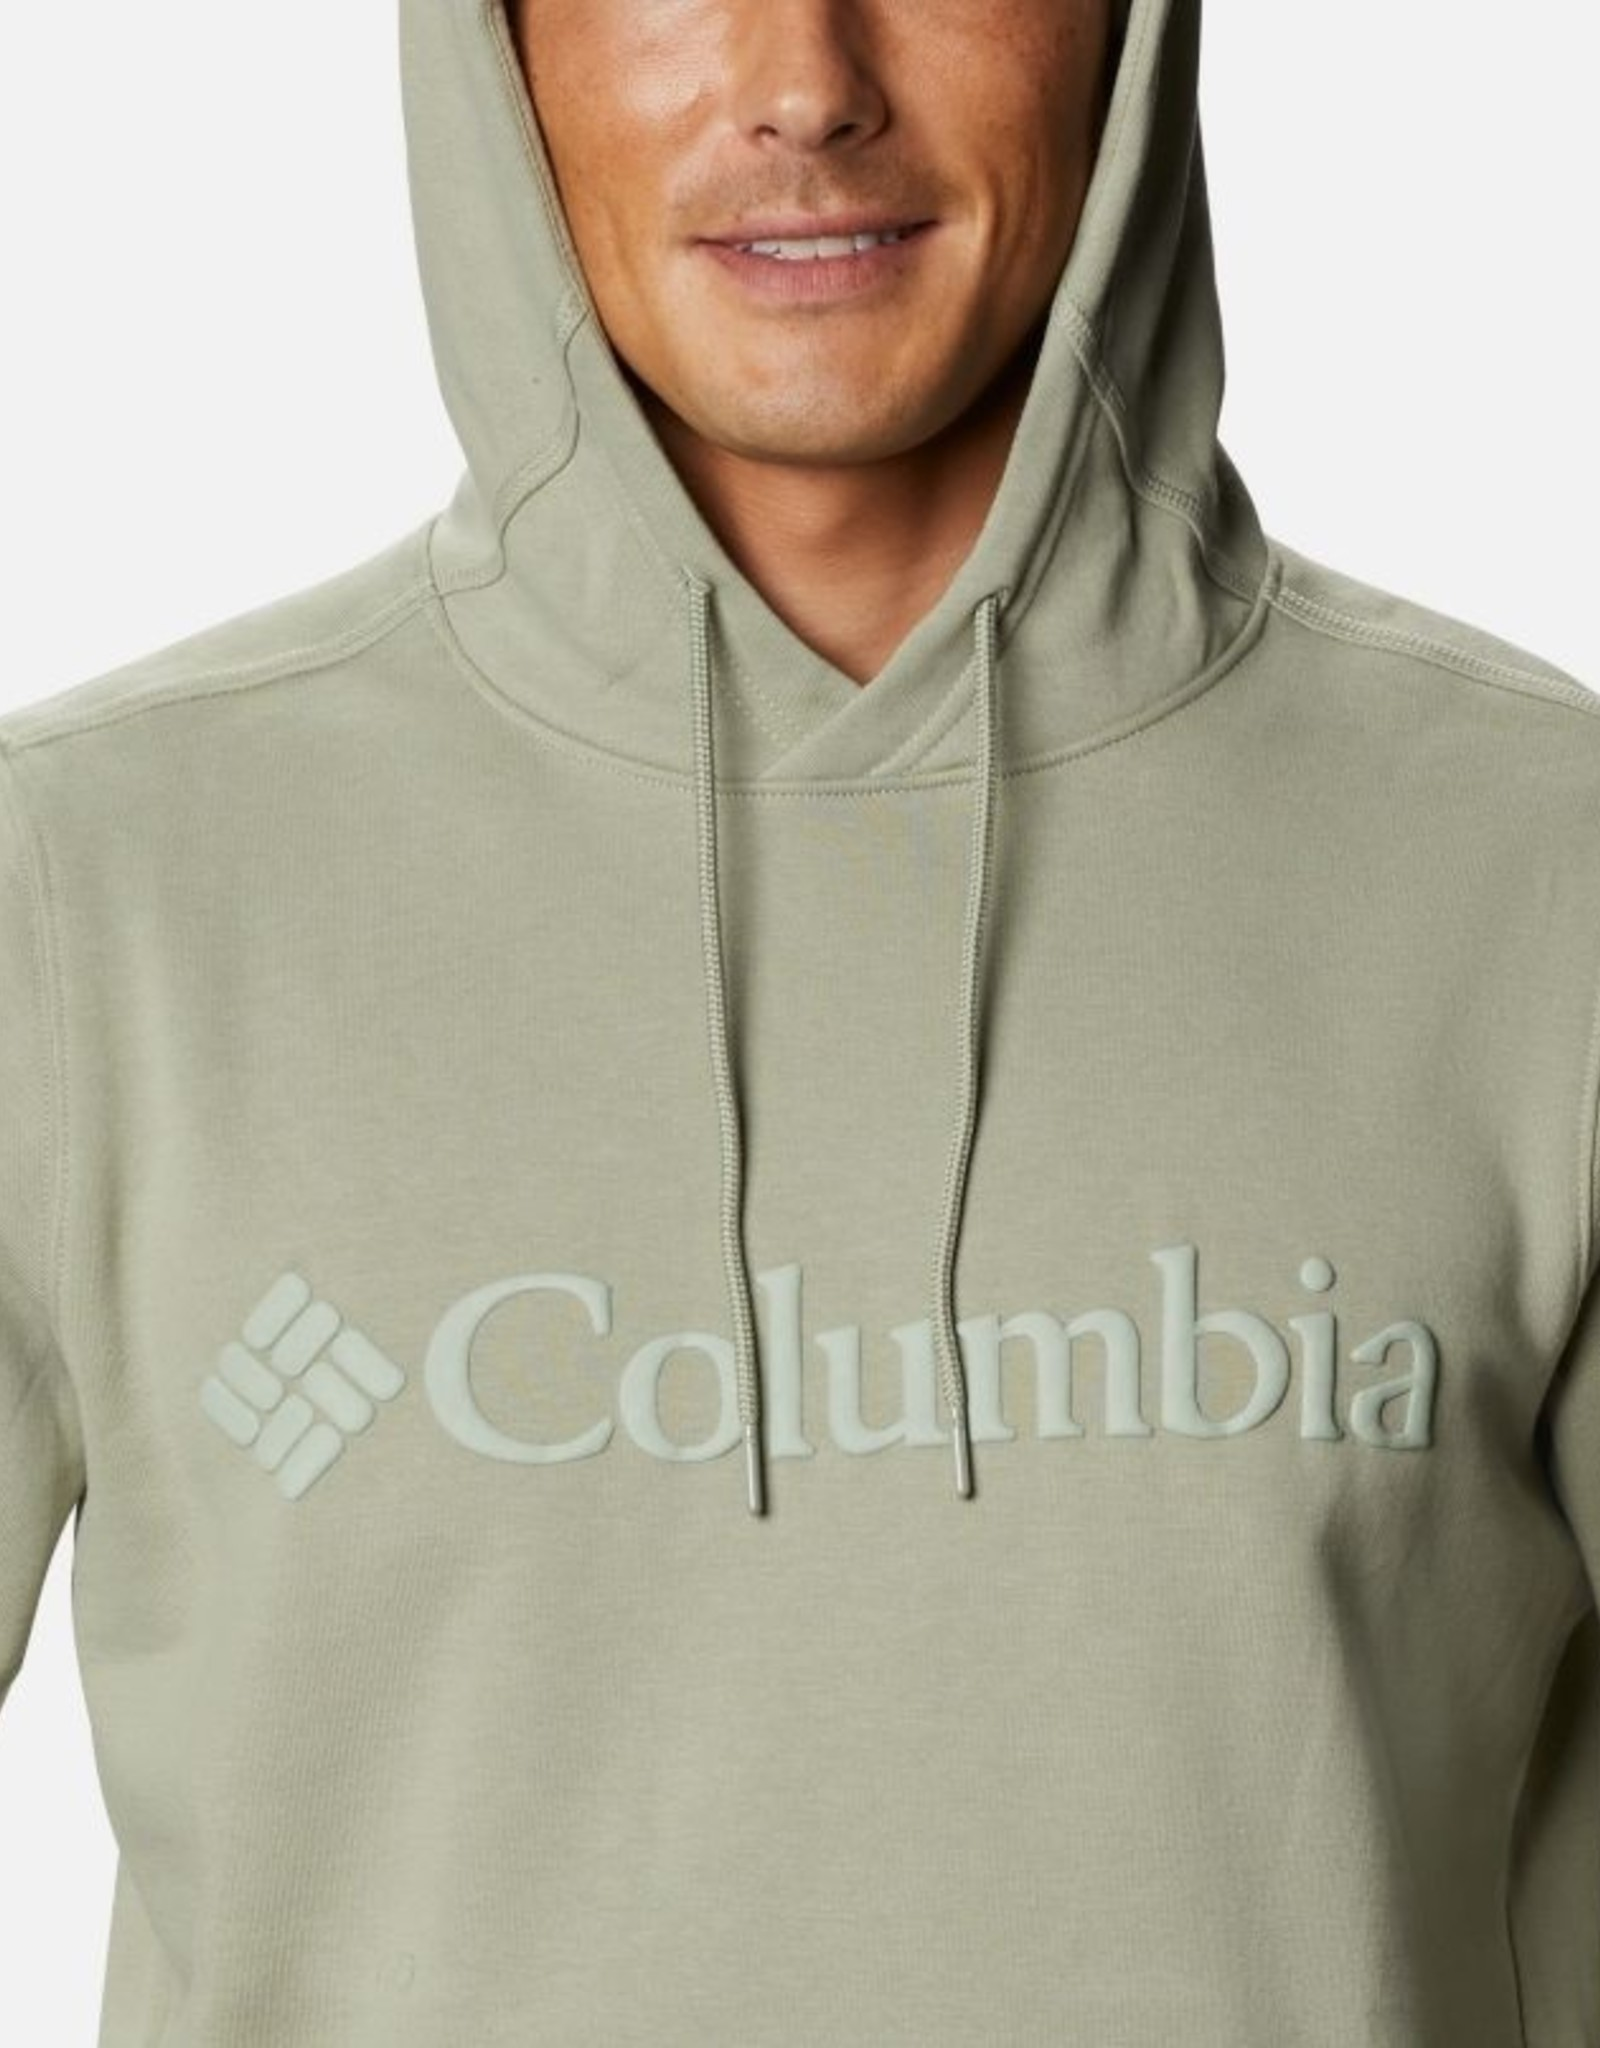 Columbia BASIC LOGO 11 HOODIE 1681661